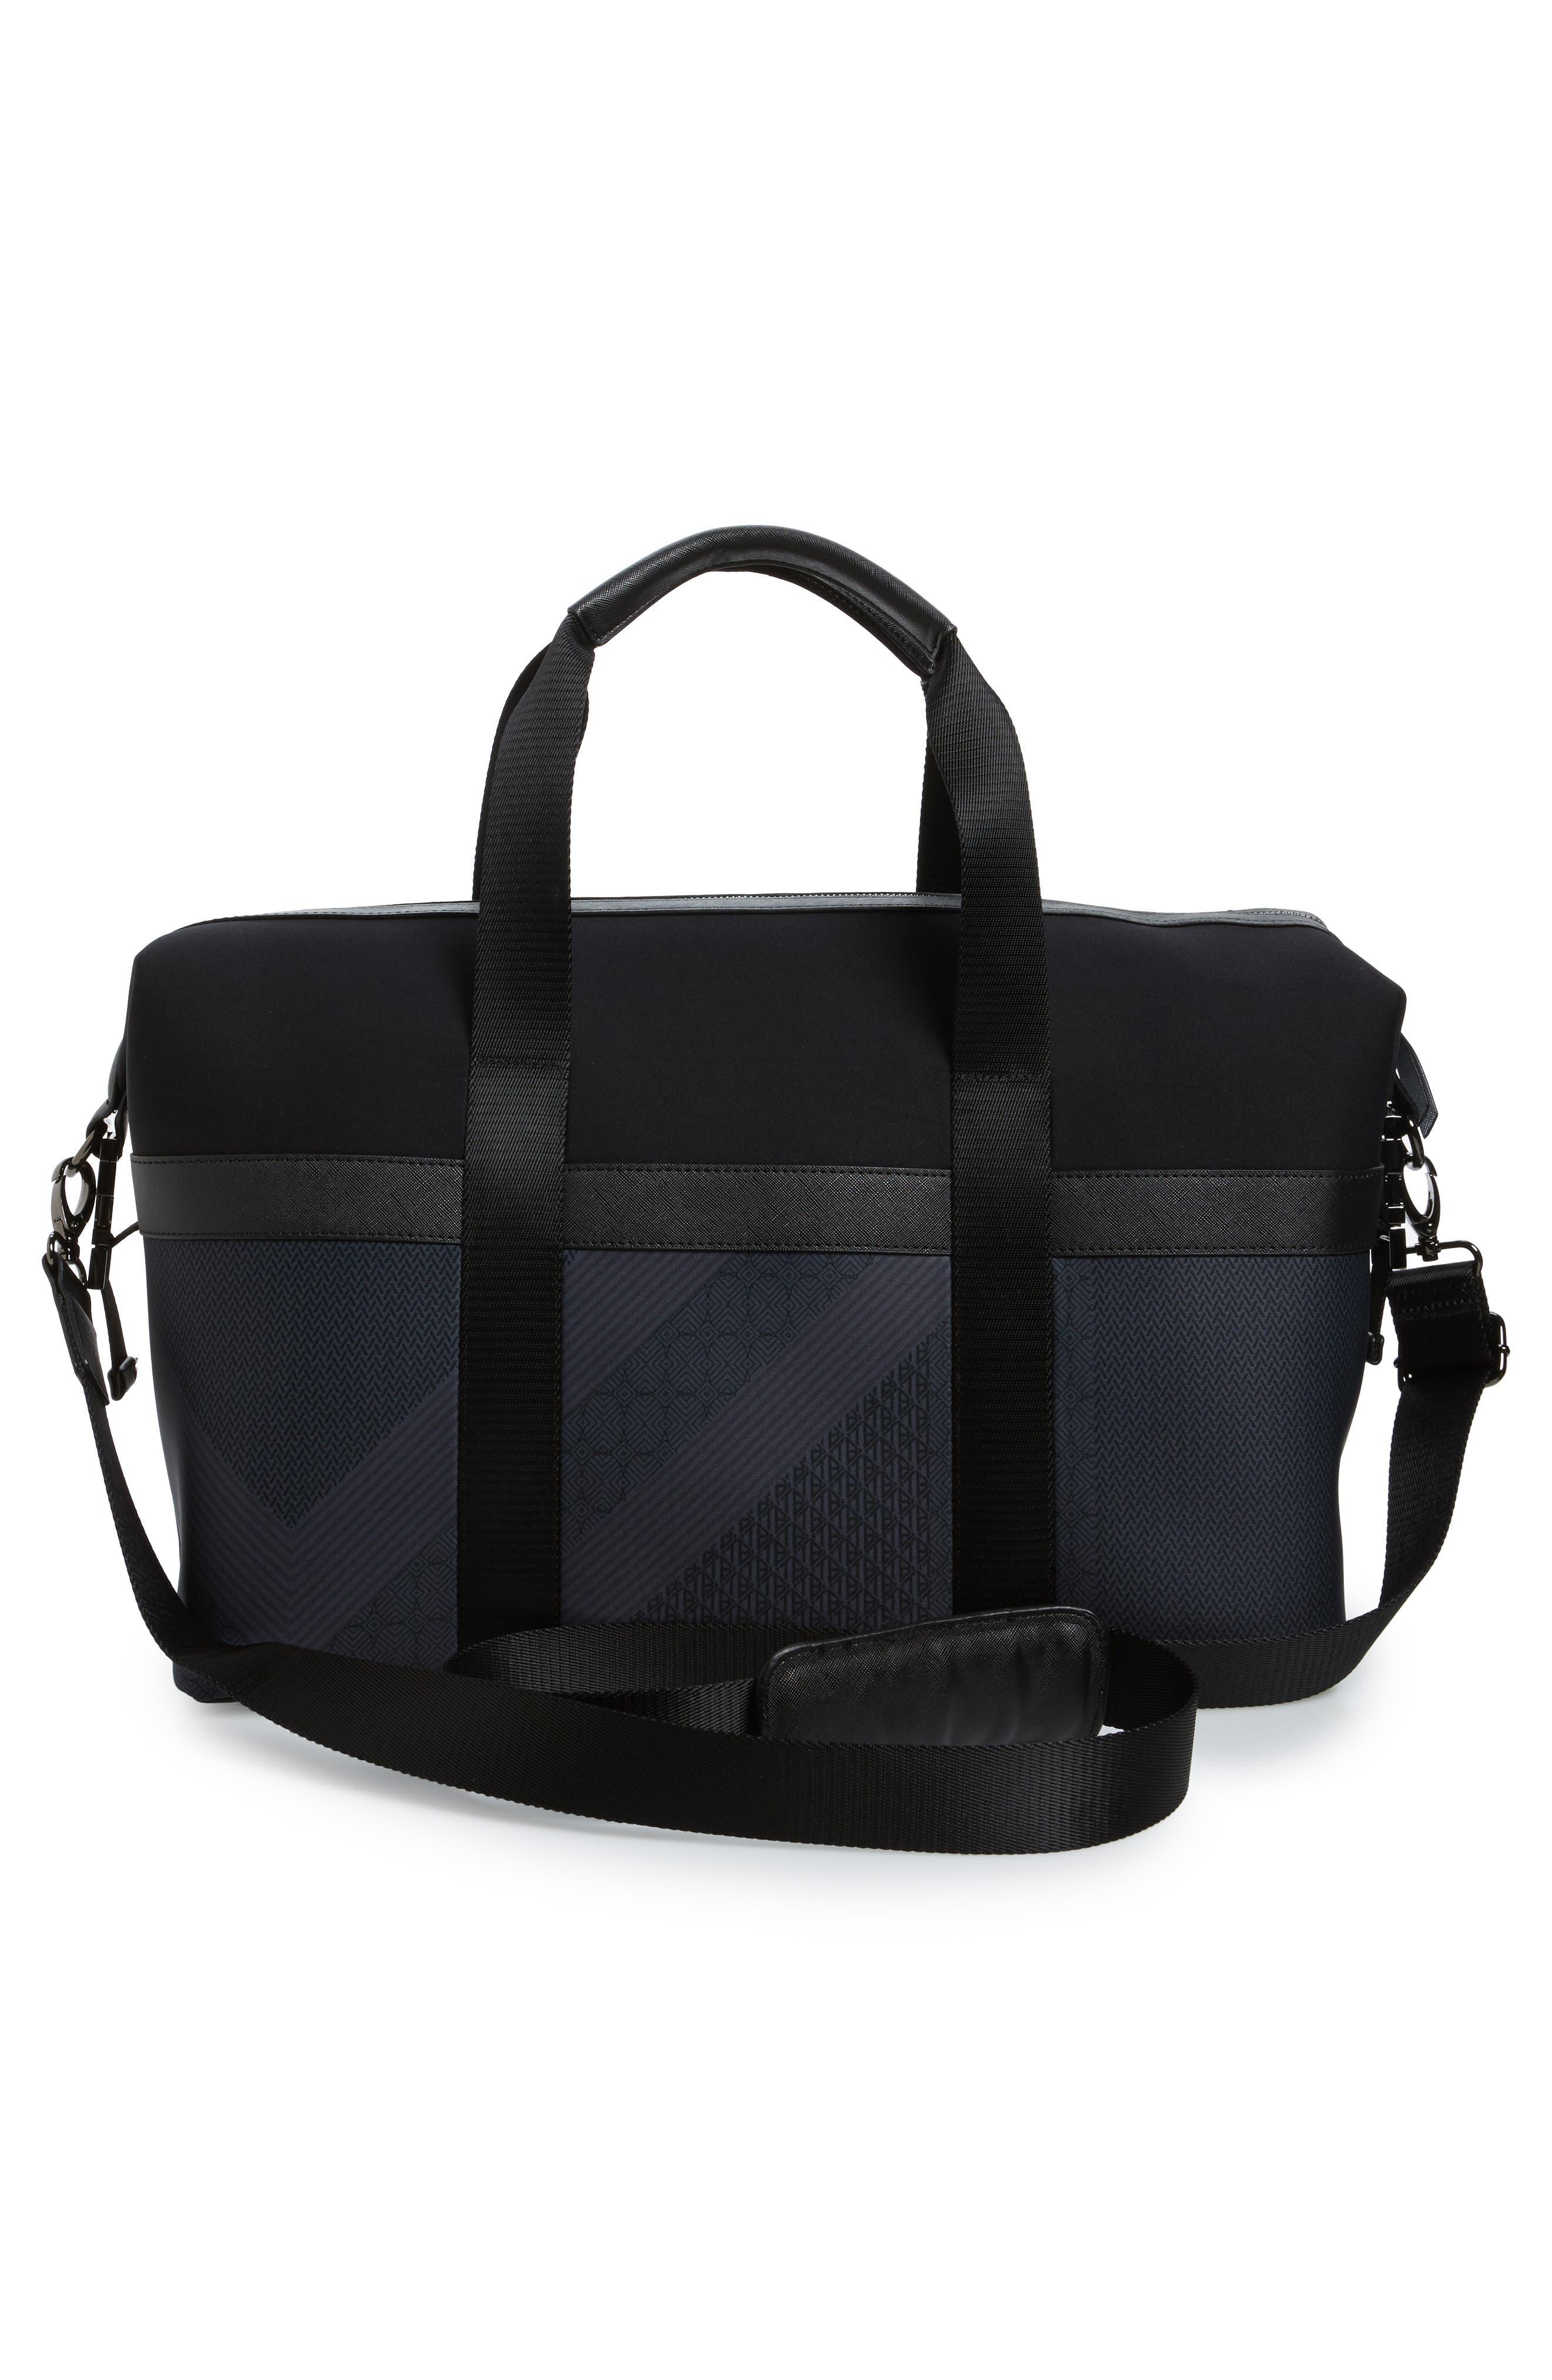 Scuba Duffel Bag,                             Alternate thumbnail 3, color,                             001